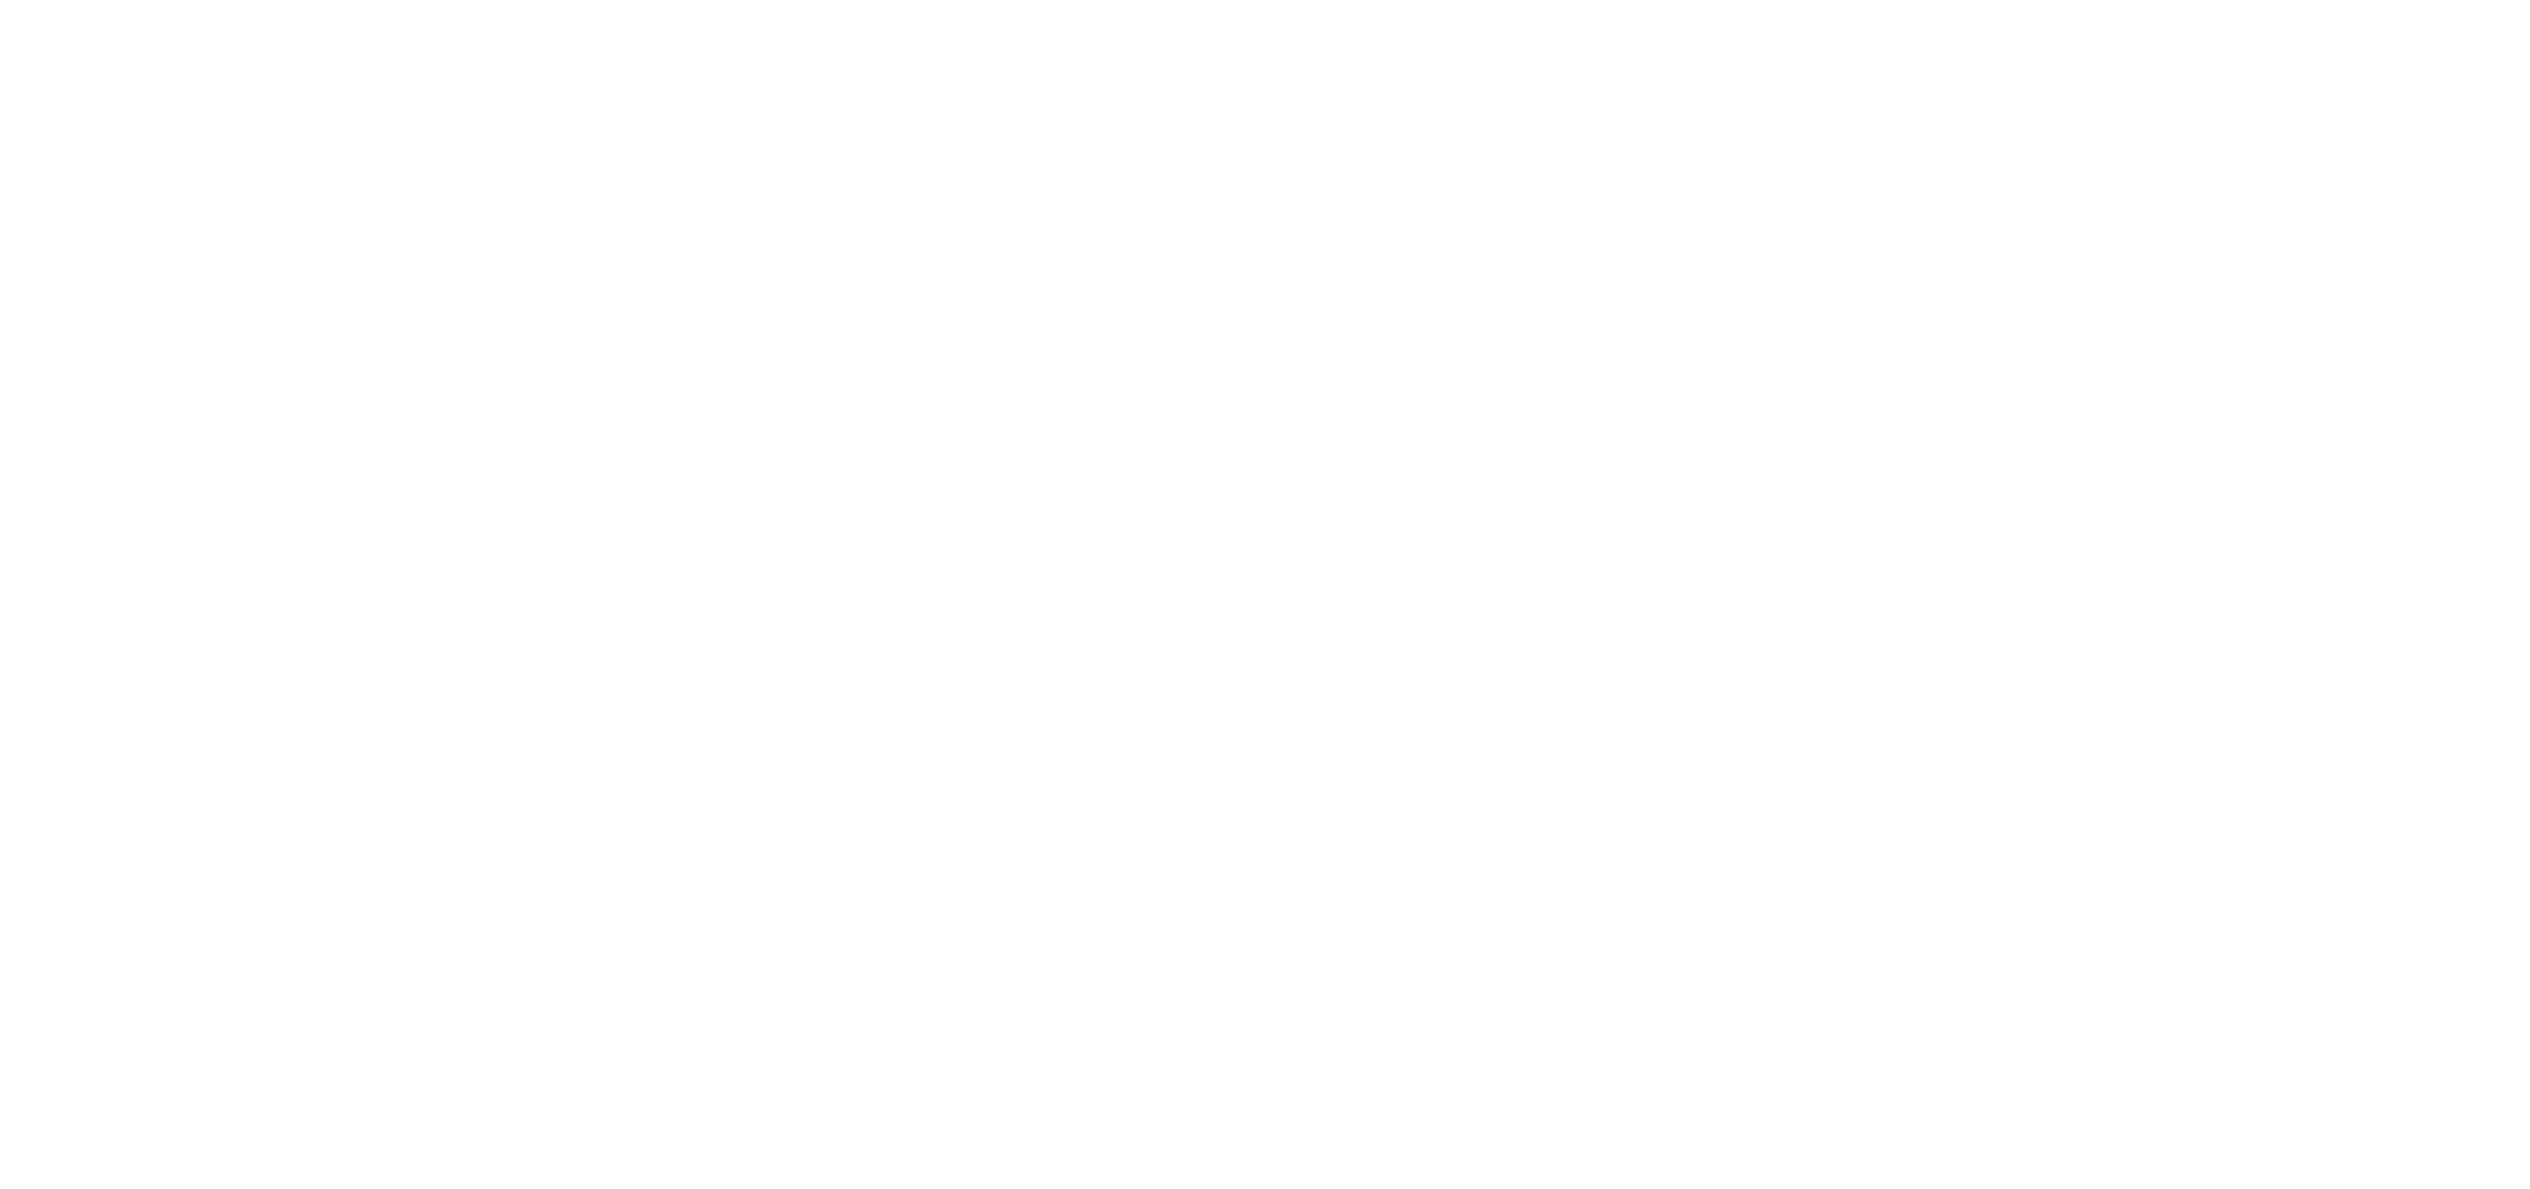 ecommerce evolution logo